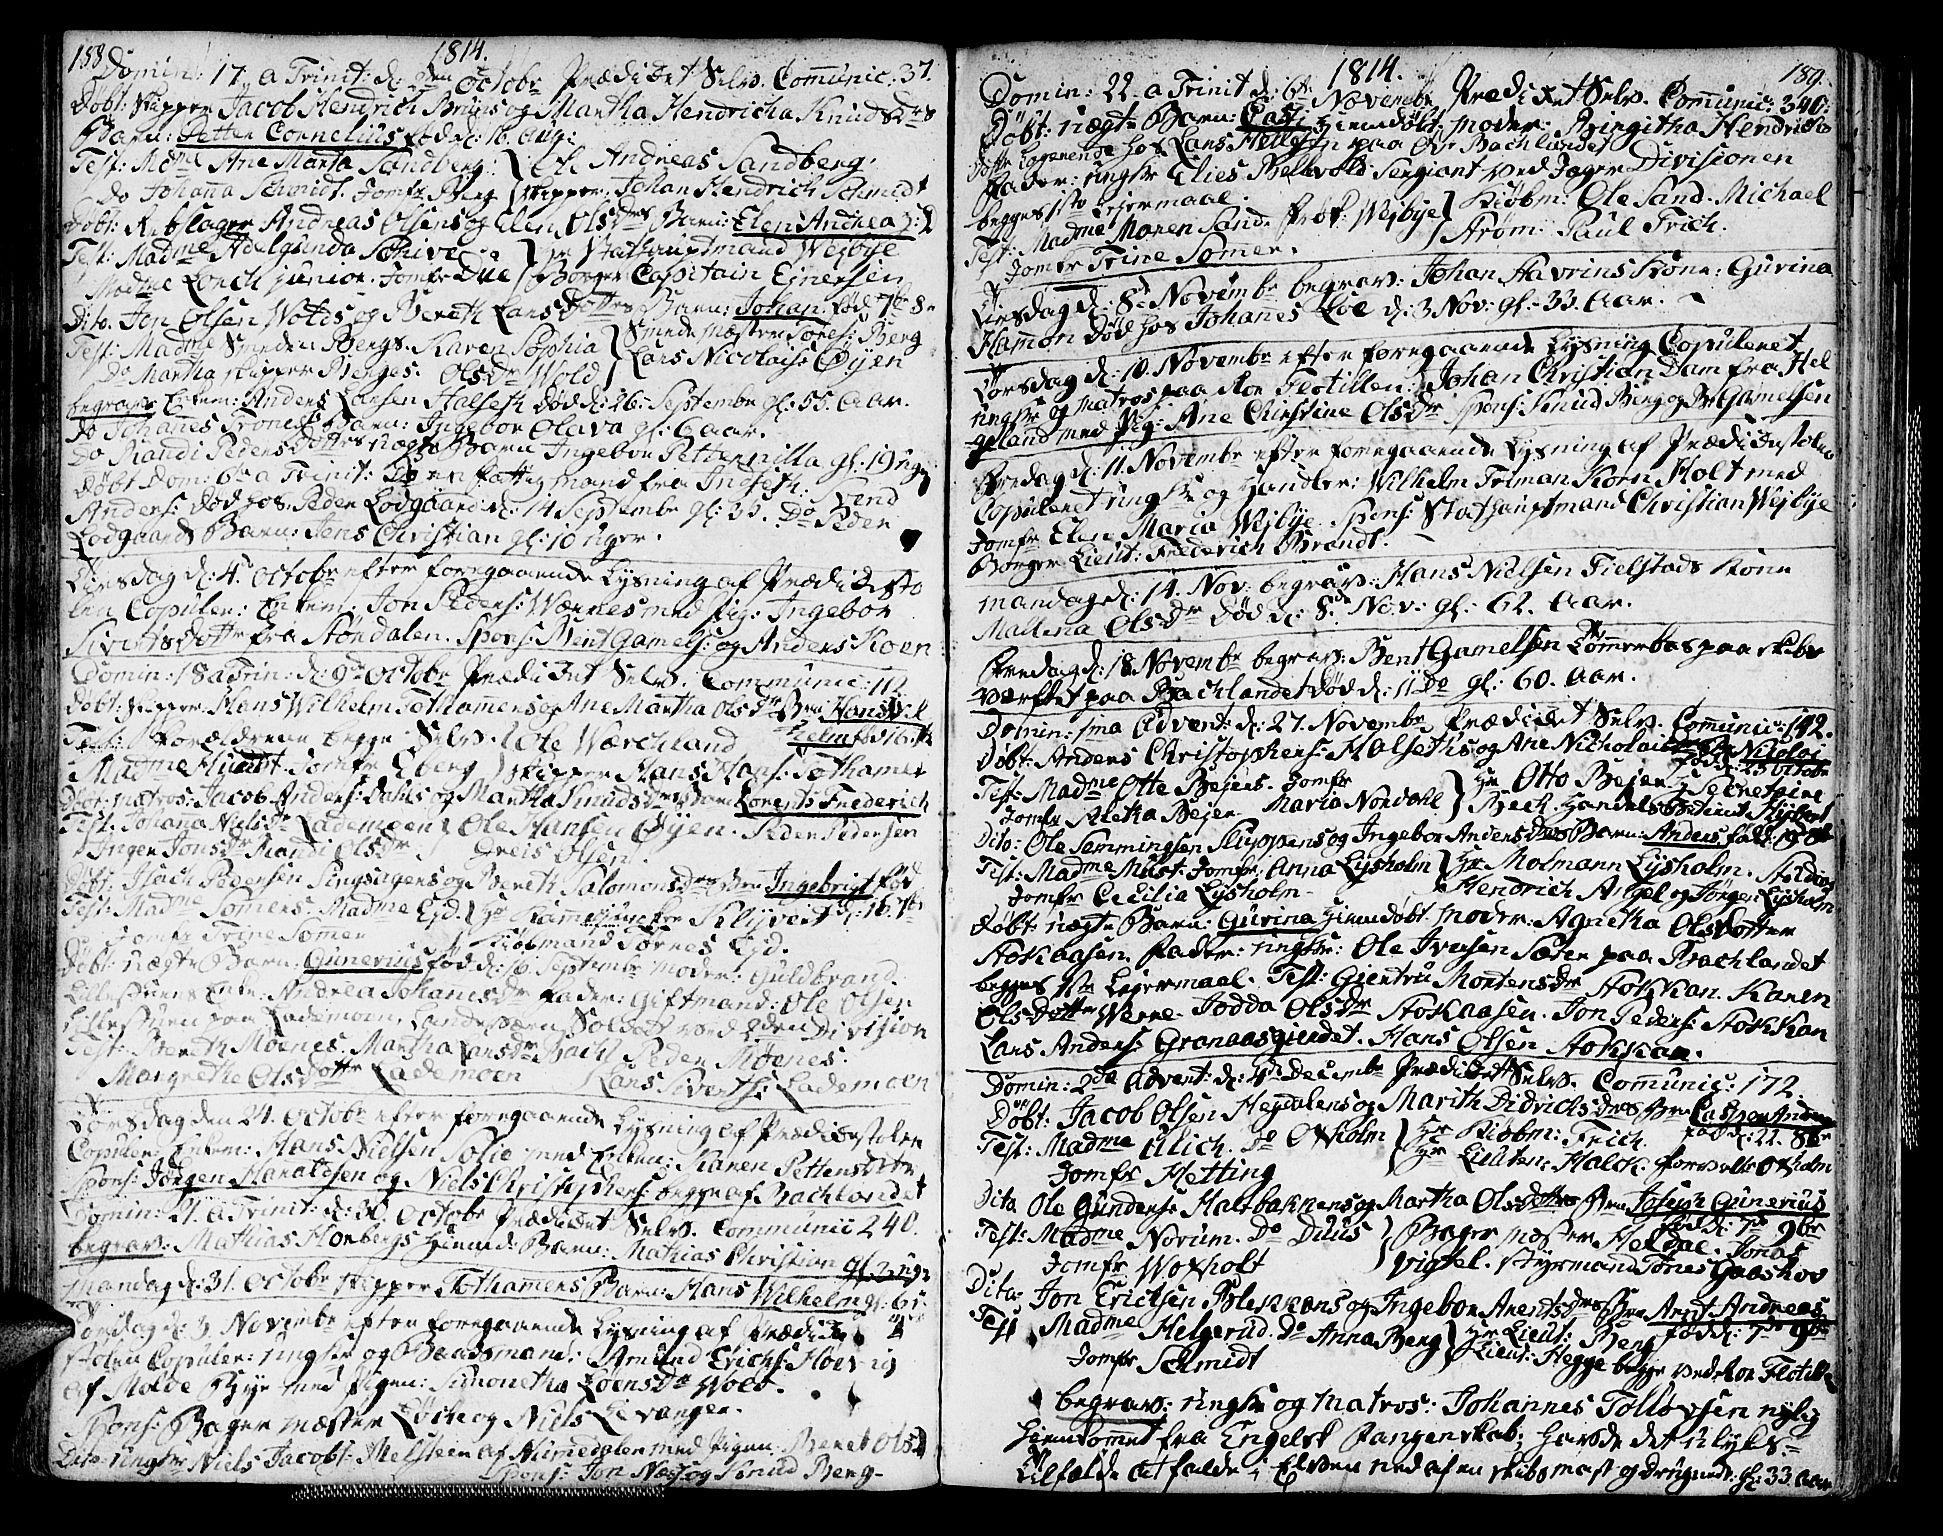 SAT, Ministerialprotokoller, klokkerbøker og fødselsregistre - Sør-Trøndelag, 604/L0181: Parish register (official) no. 604A02, 1798-1817, p. 188-189